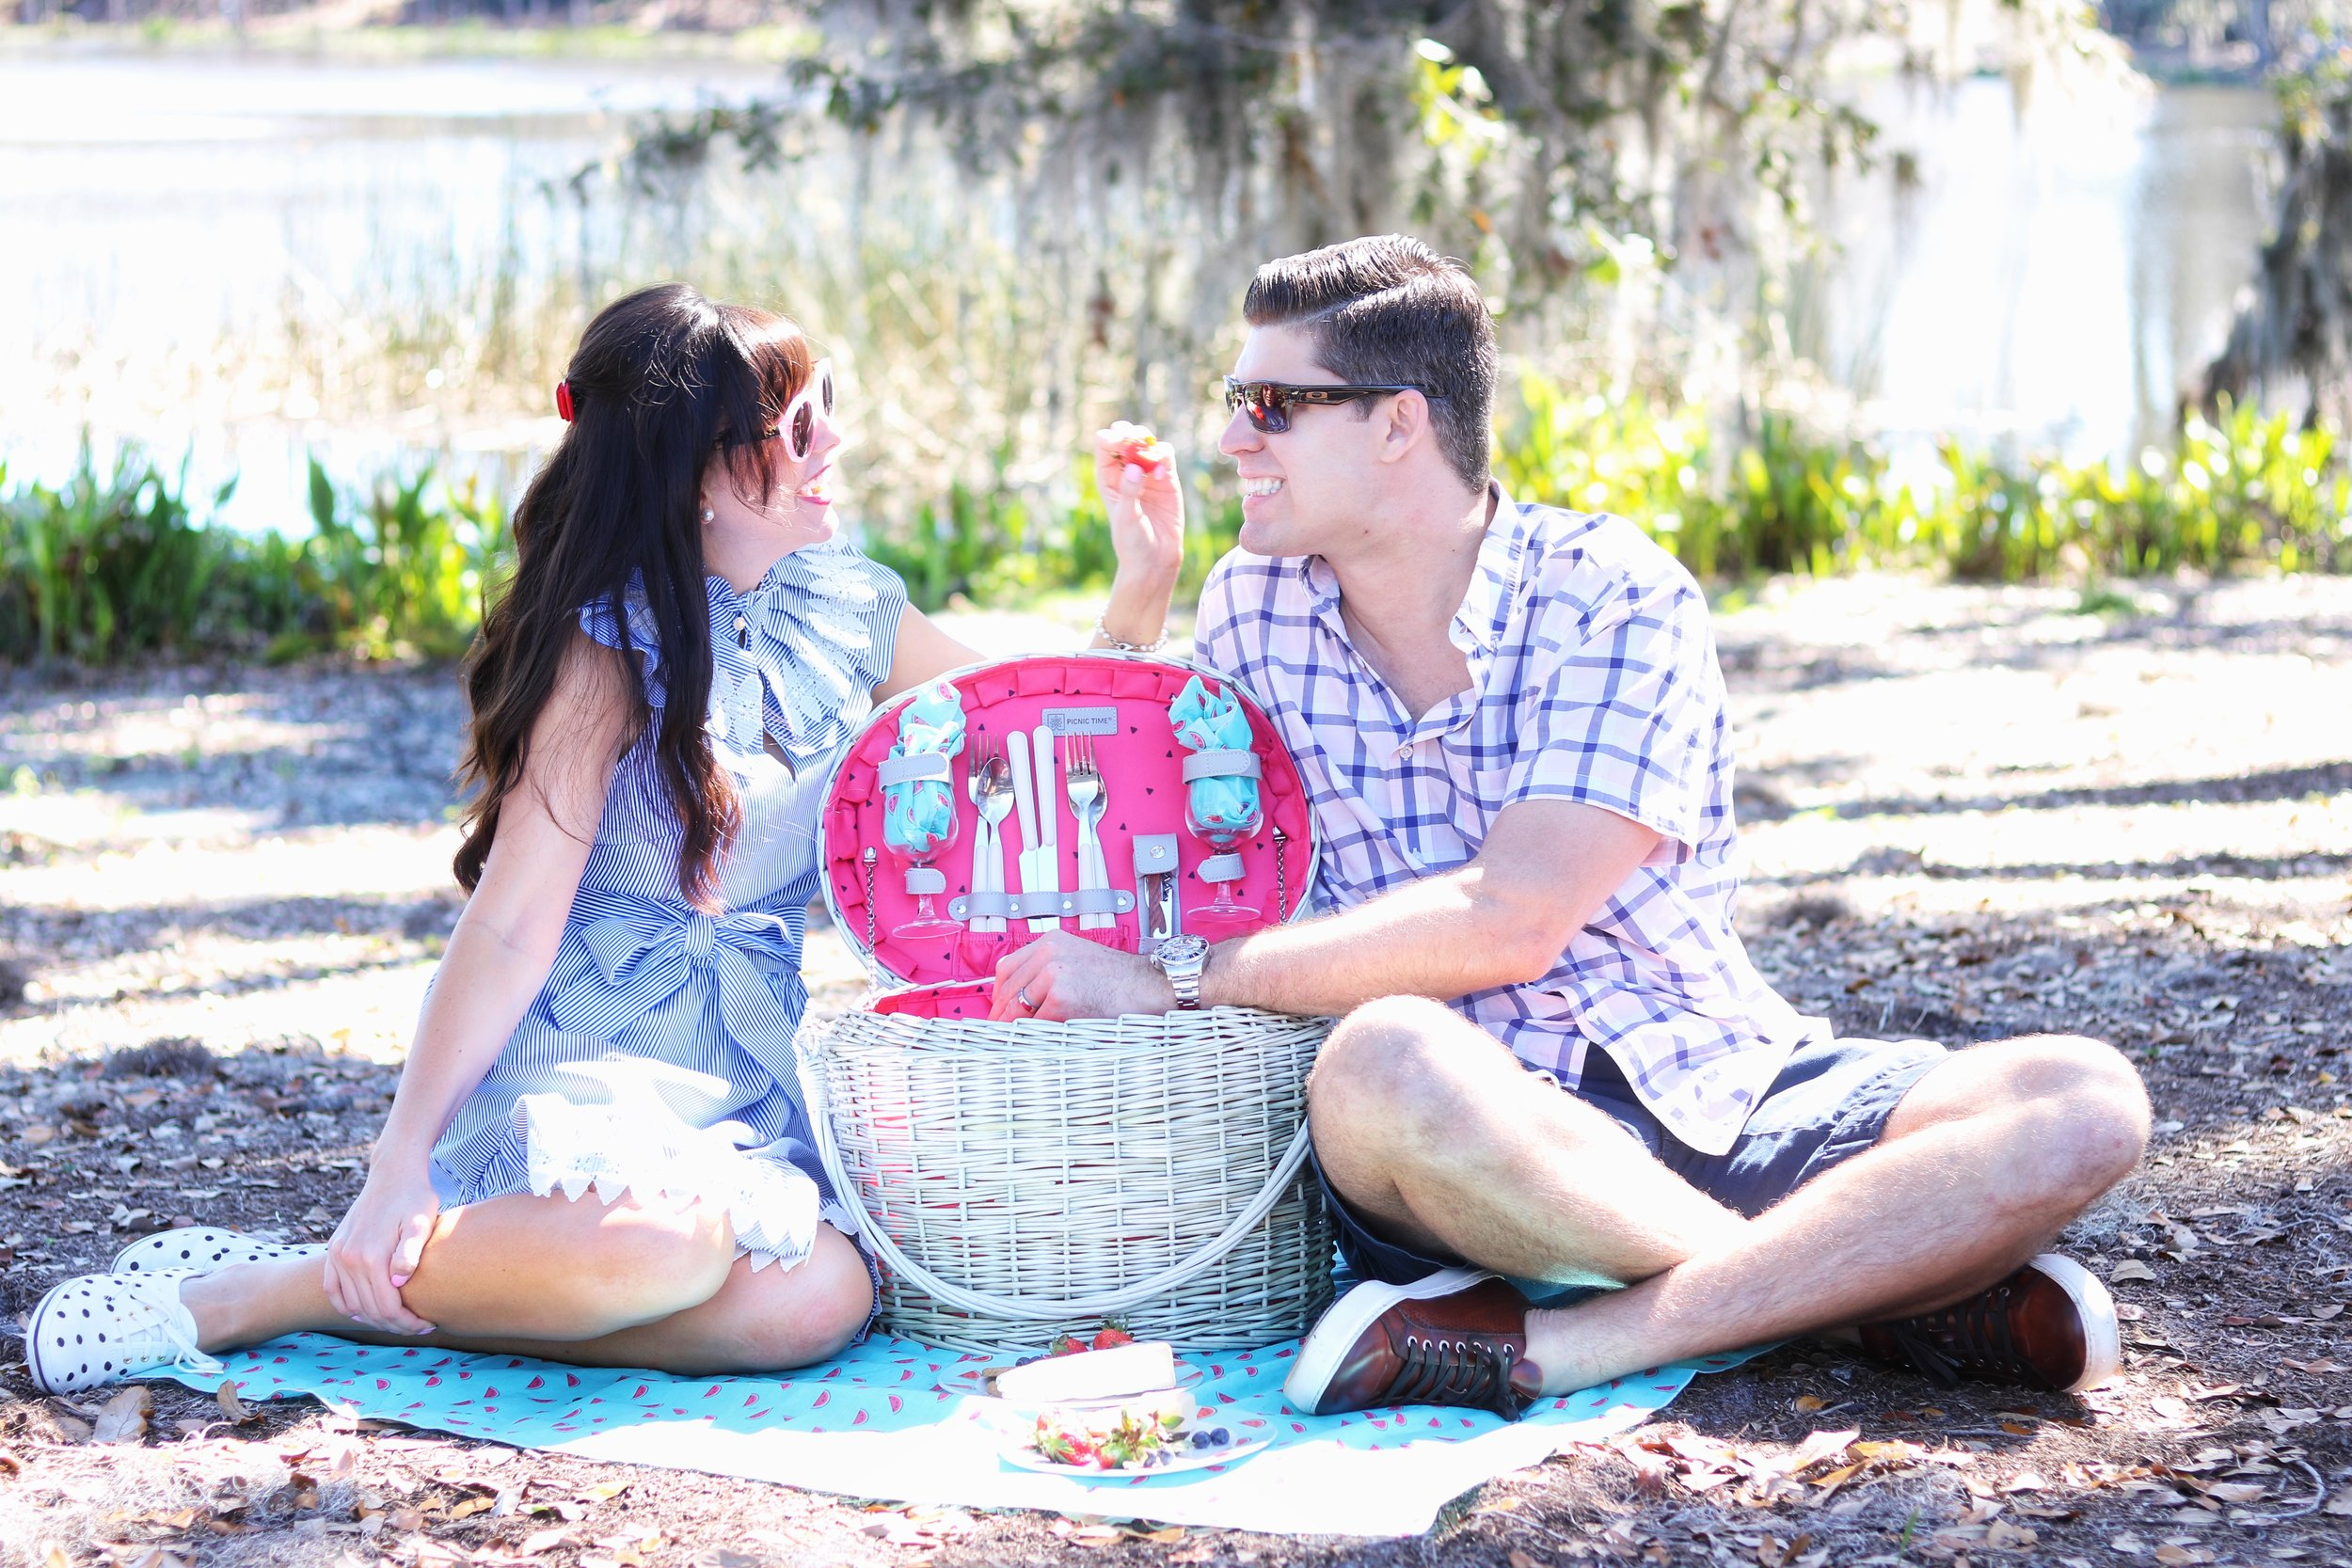 Picnic Time Romance picnic basket.jpg